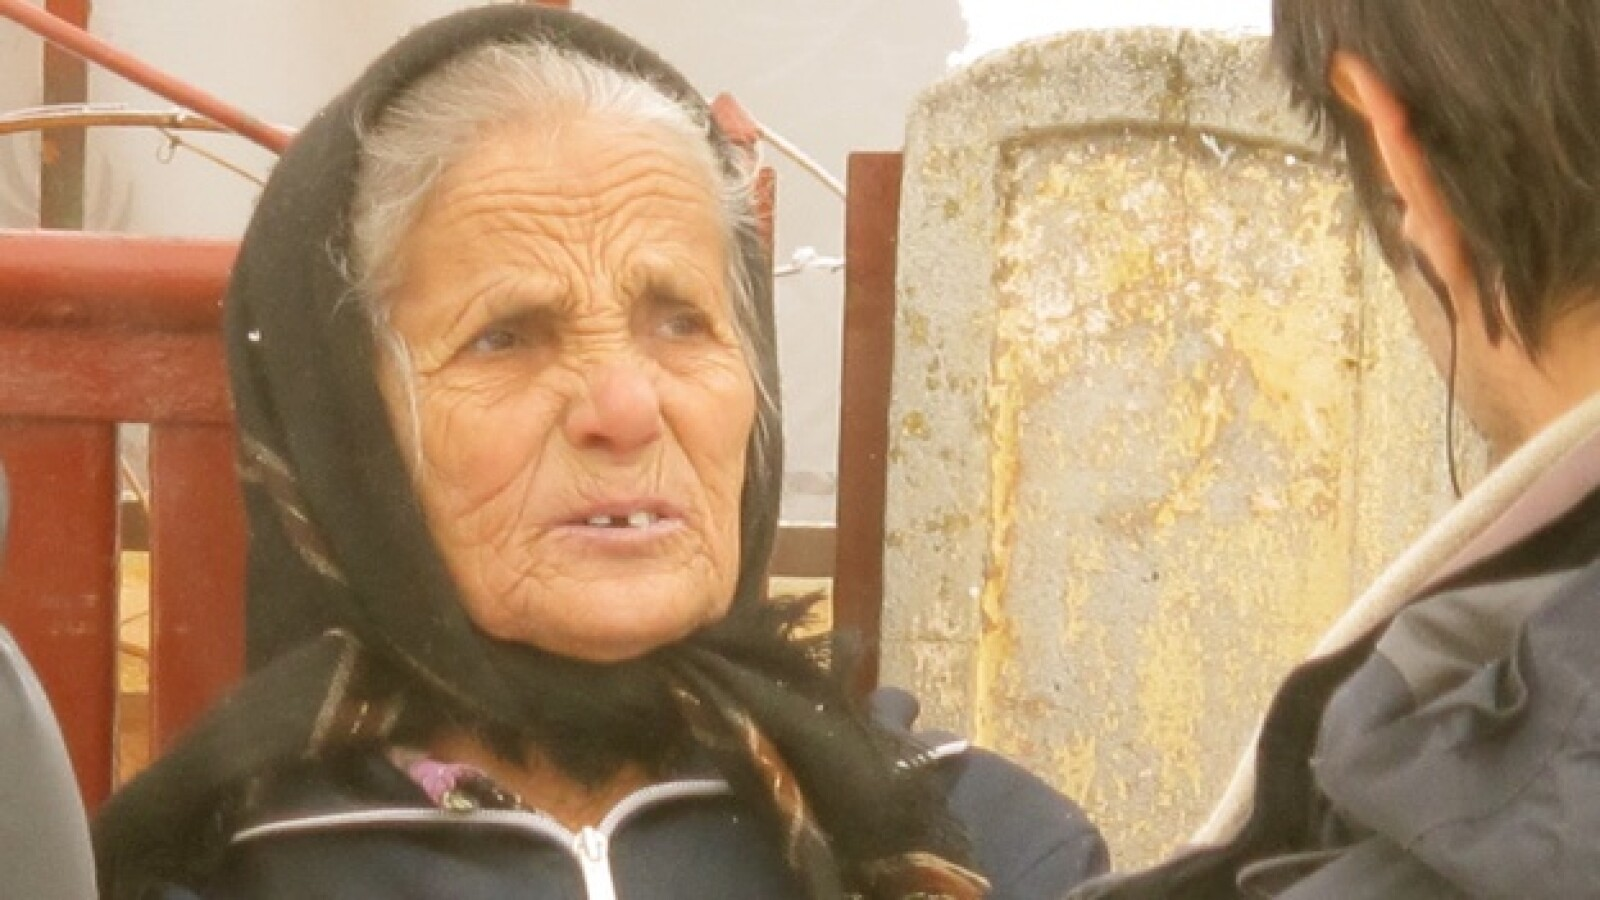 Rumania - trata de personas -madre de traficante